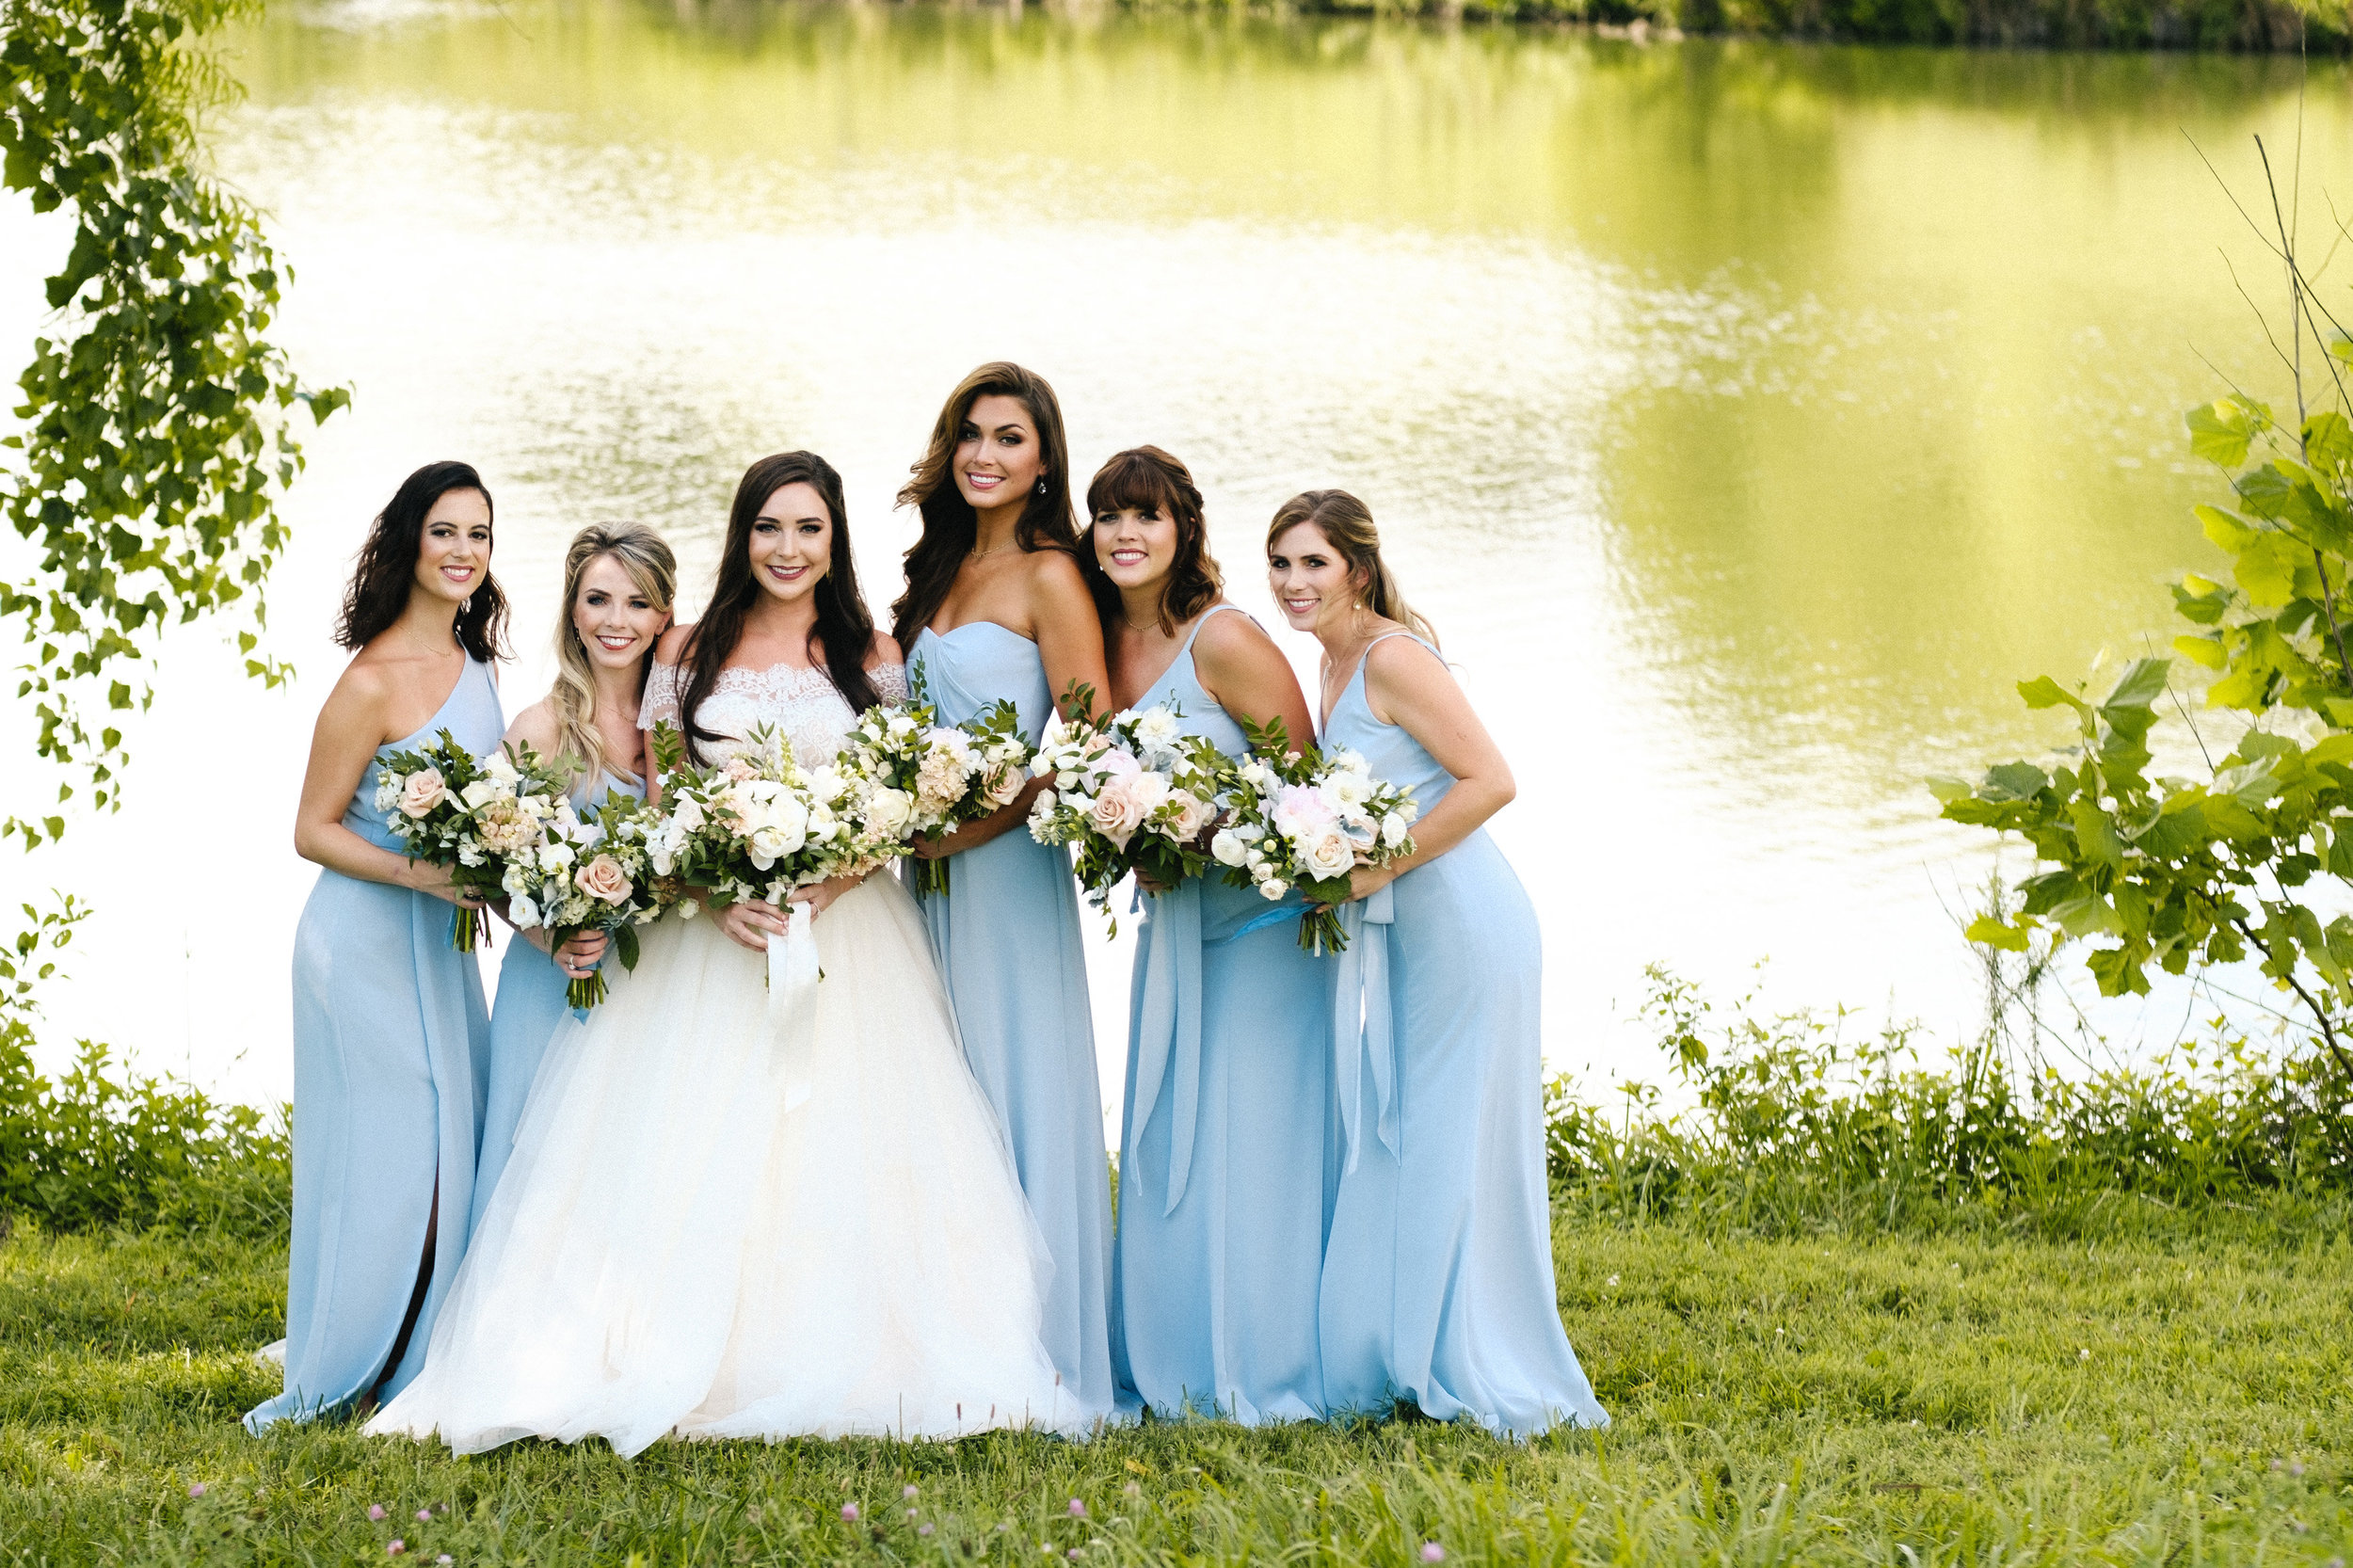 Nashville_Wedding_Photography_Mint_Springs_45.jpg